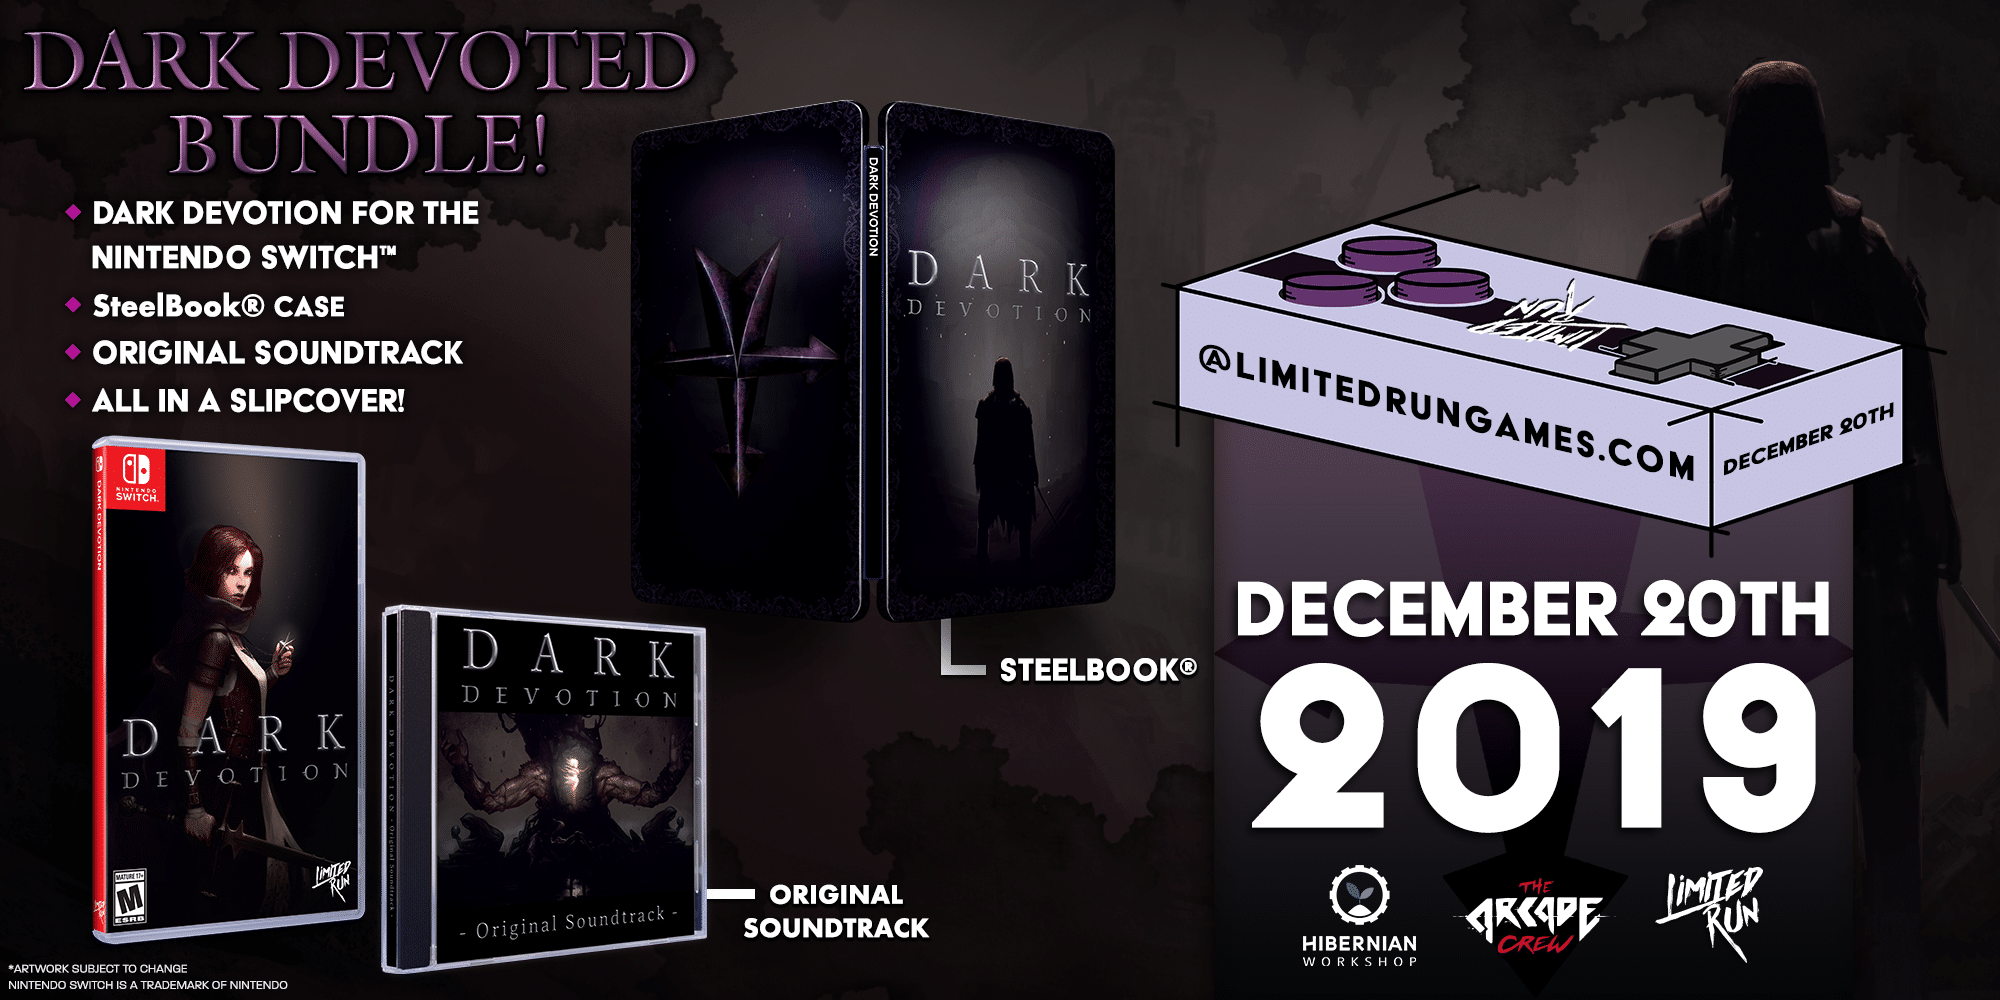 La Dark Devotion Bundle Edition